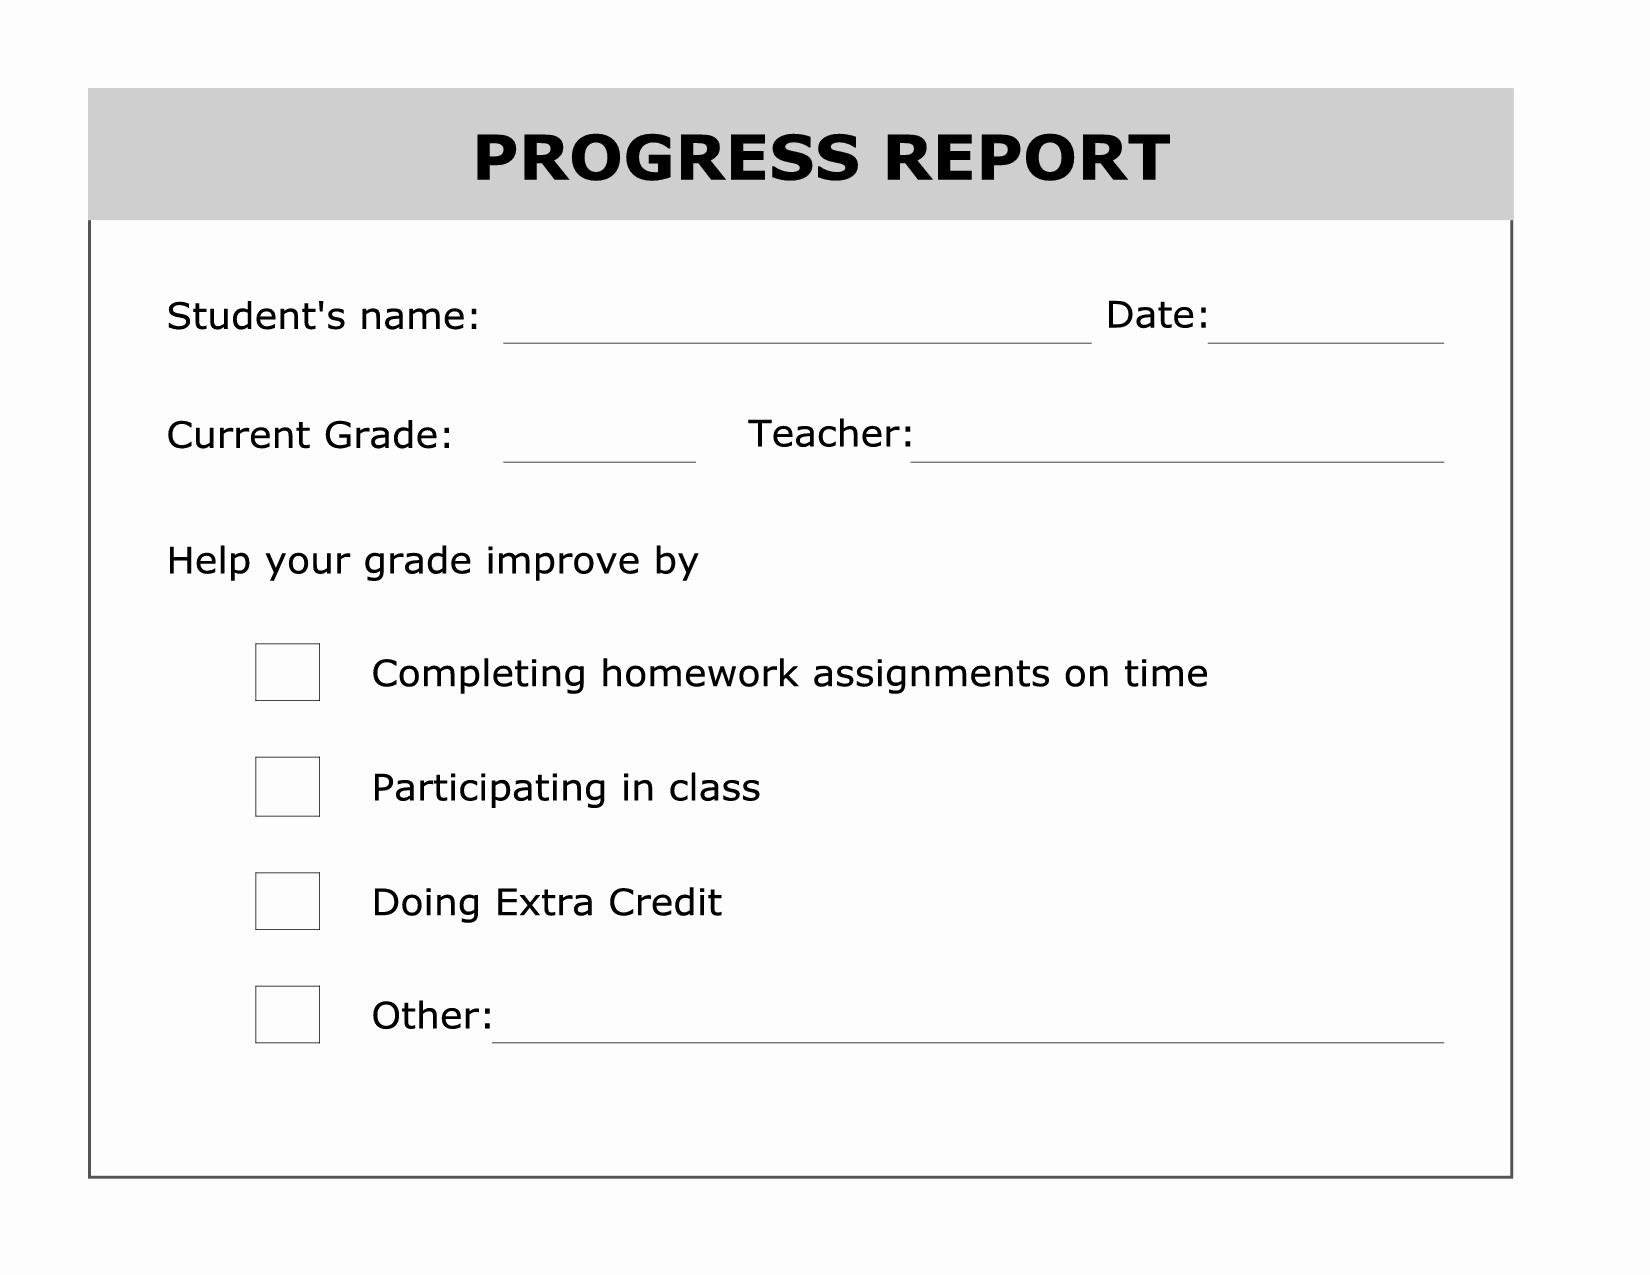 Grade Progress Report Template Elegant Printable Progress Report Template